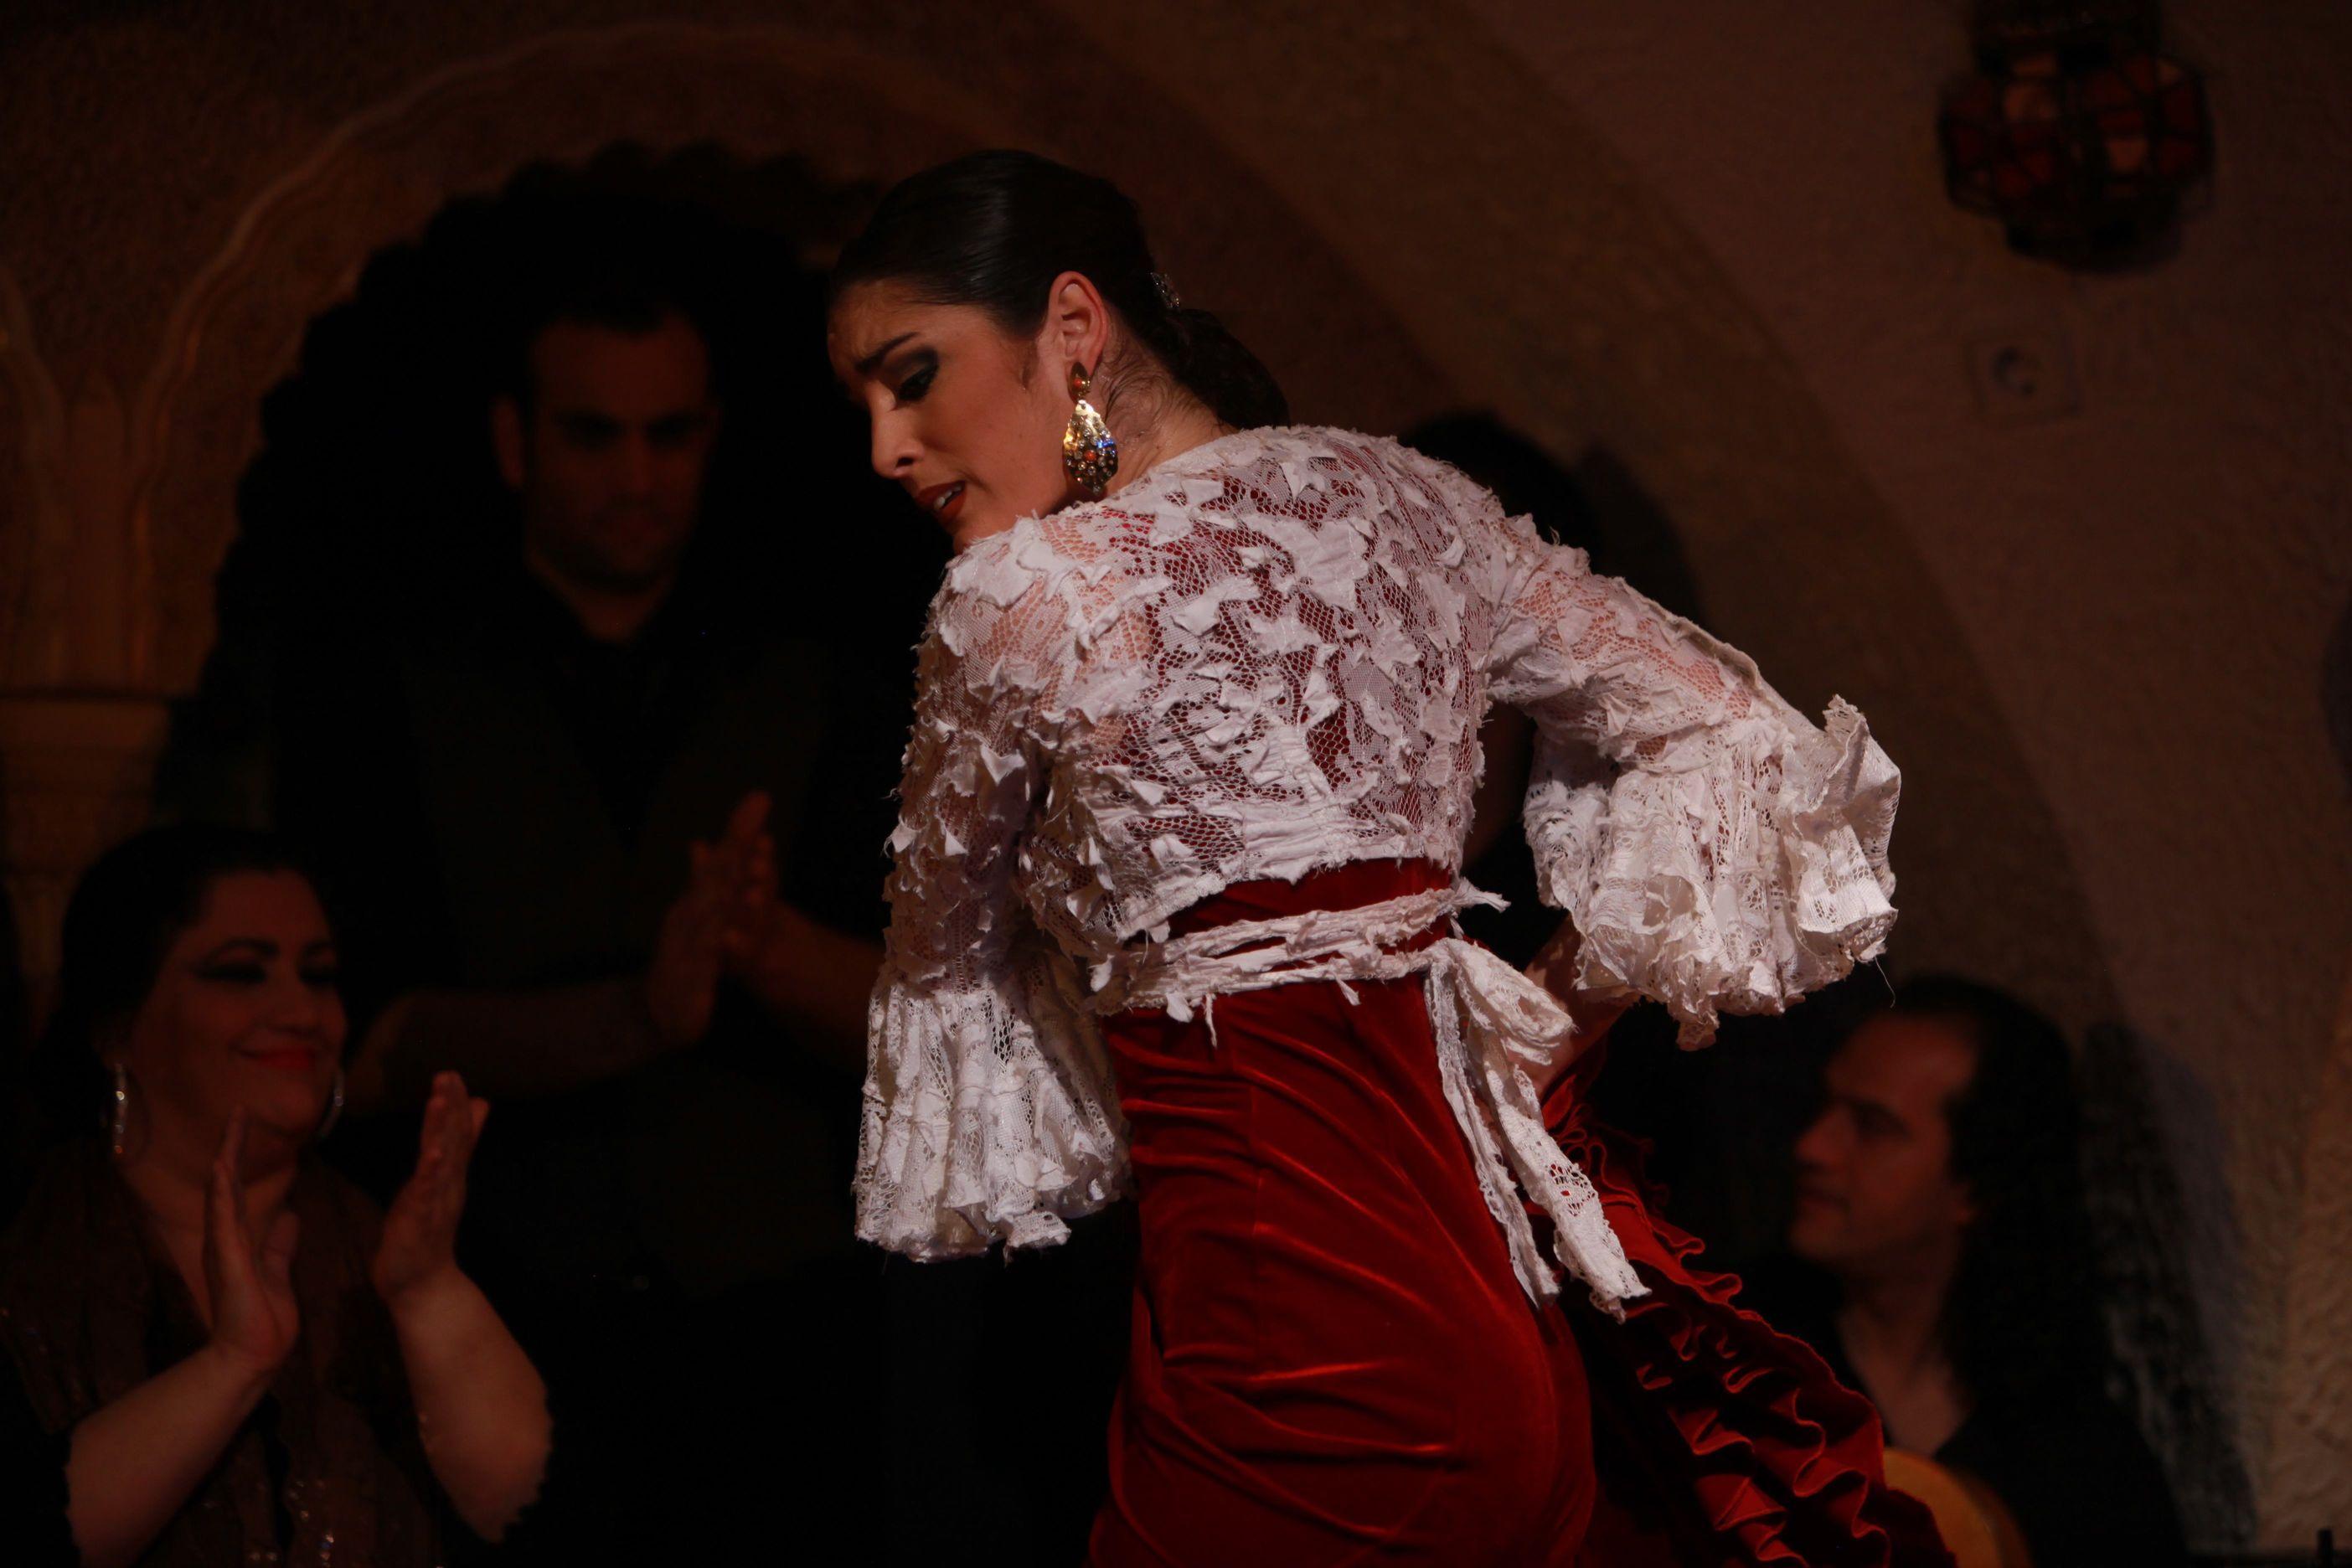 Olga Llorente. Mayo del 2009